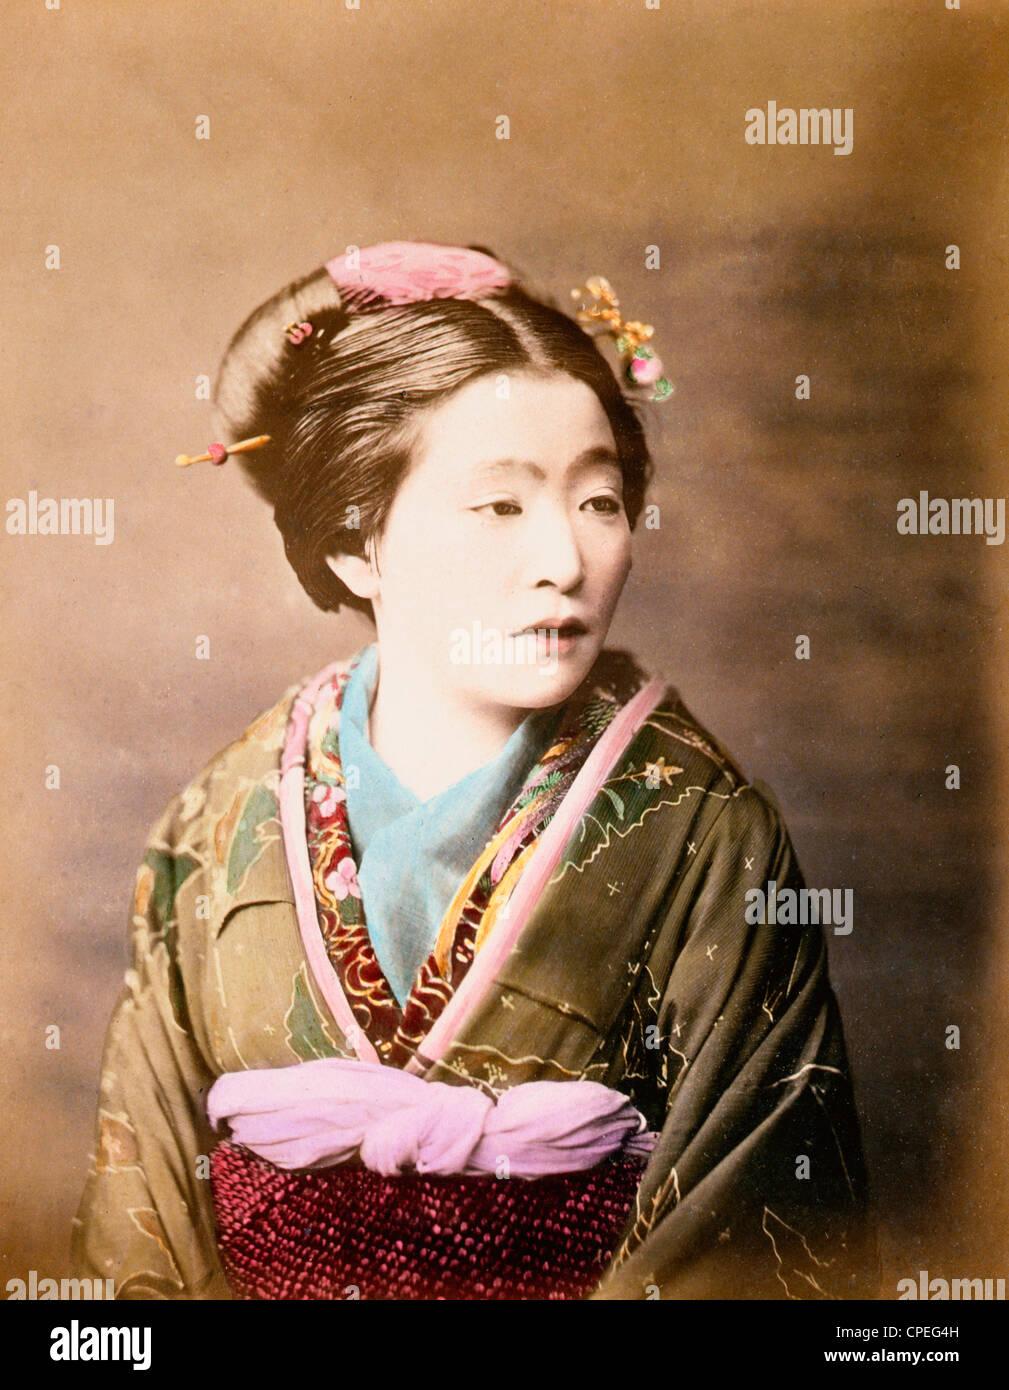 Ukiyo-e beauty, half-length studio portrait of a woman, facing slightly right, Japan woodblock print, circa 1877 - Stock Image